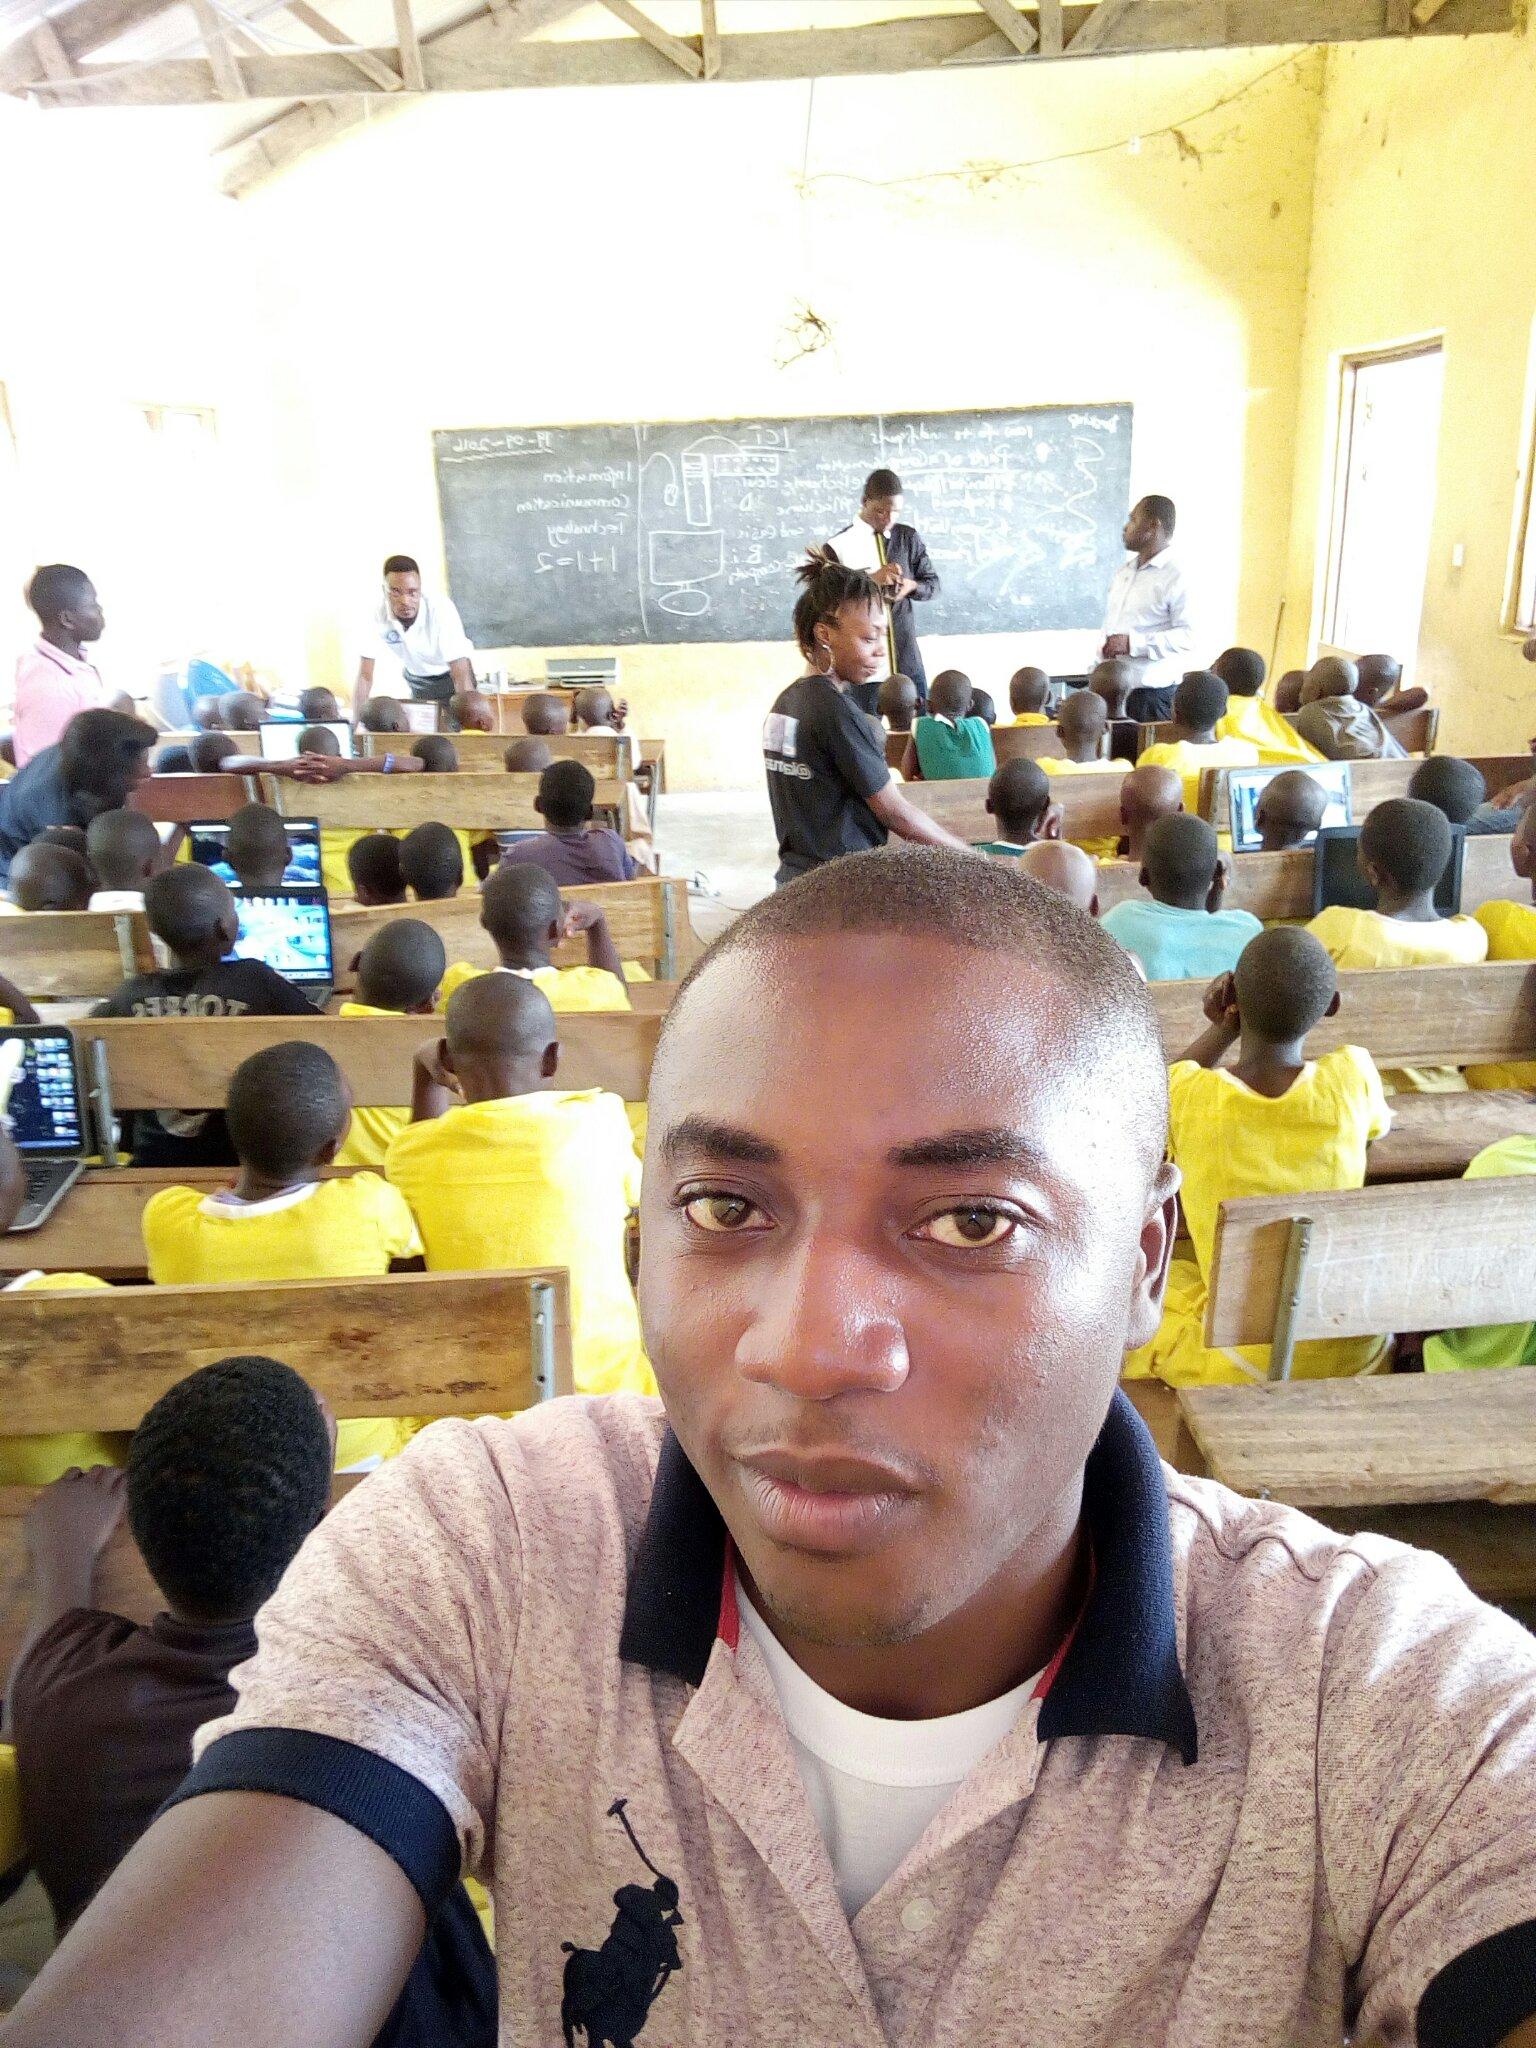 #nvday16 I volunteered! Did you? #ruraleducation  @kofiemeritus @akyherb @Abocco https://t.co/WZOTFSWE7H